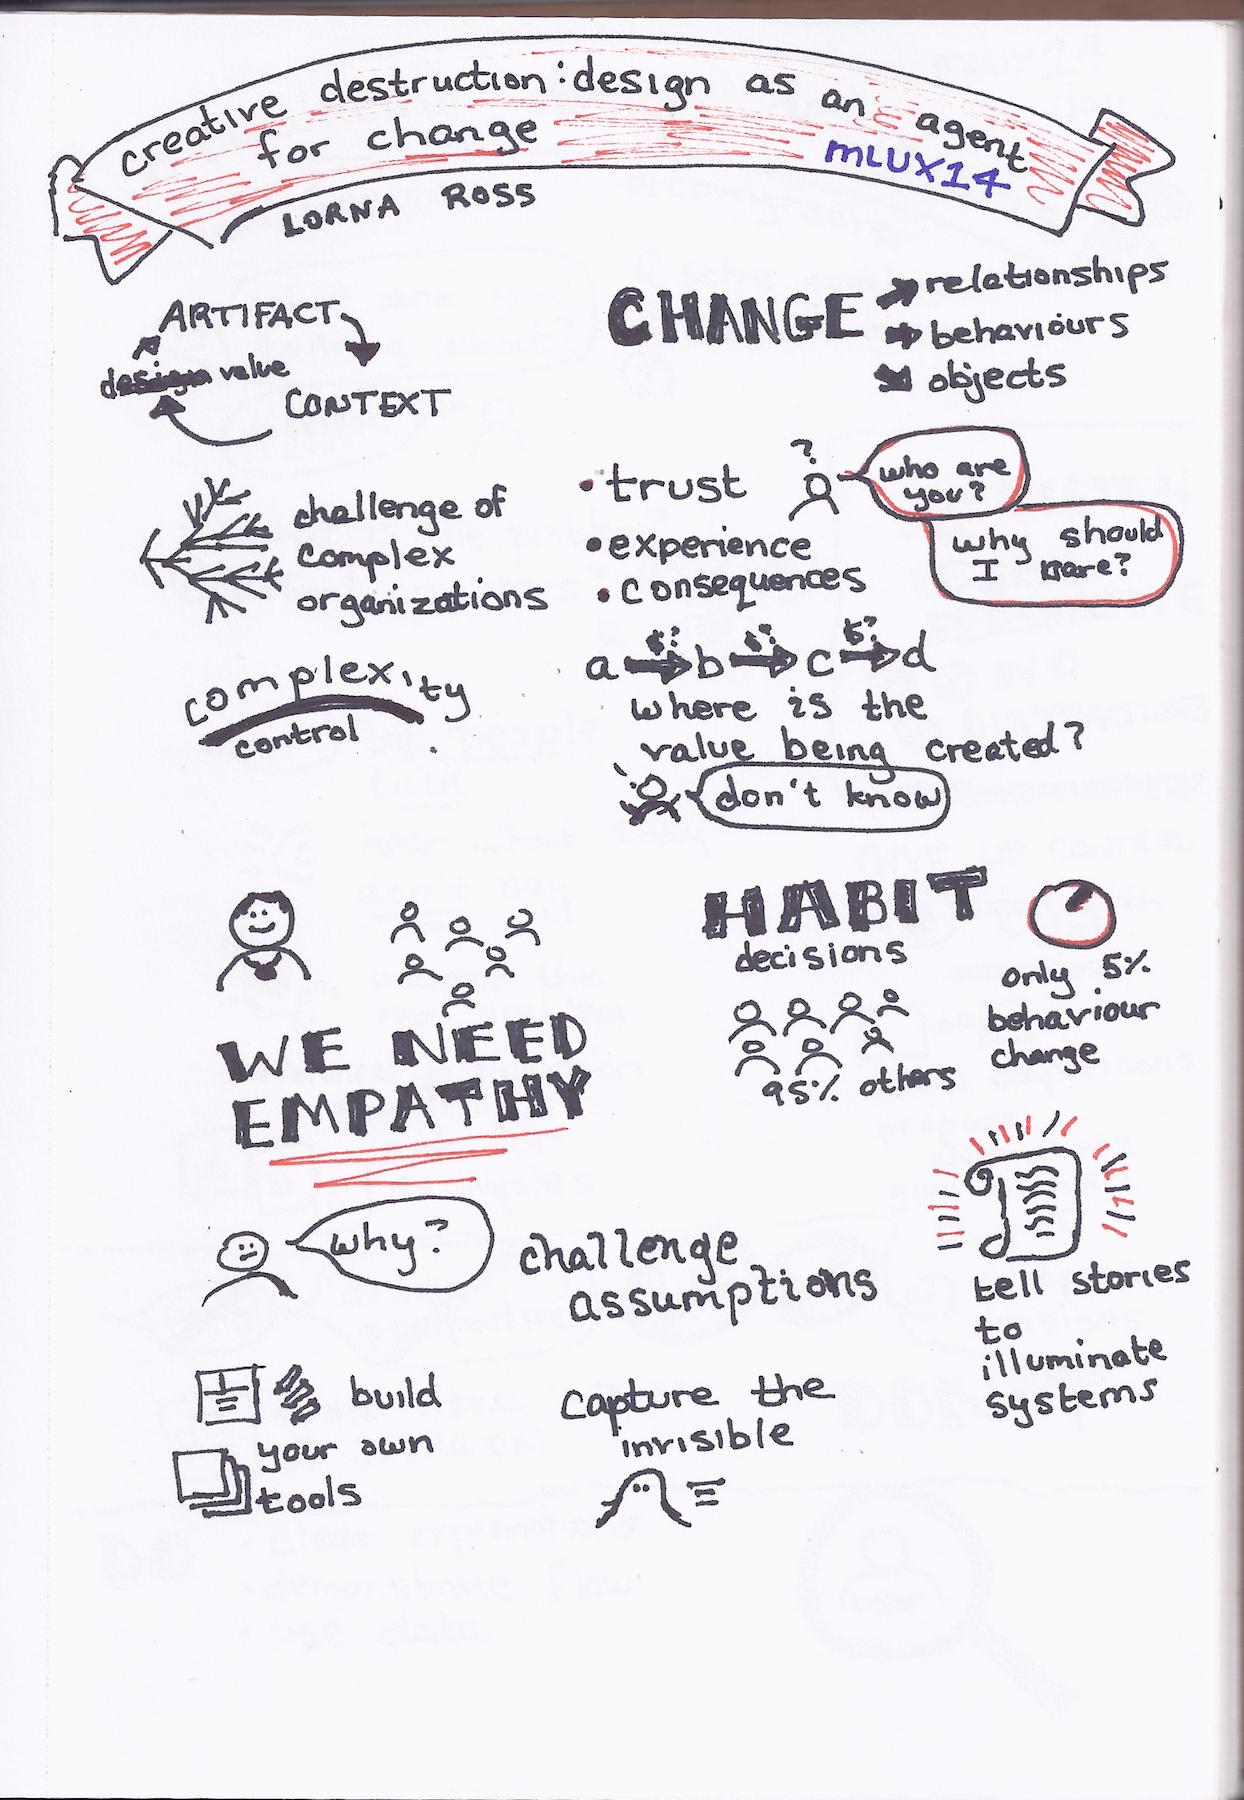 Creative Destruction - Design as an Agent for Change (Lorna Ross).png